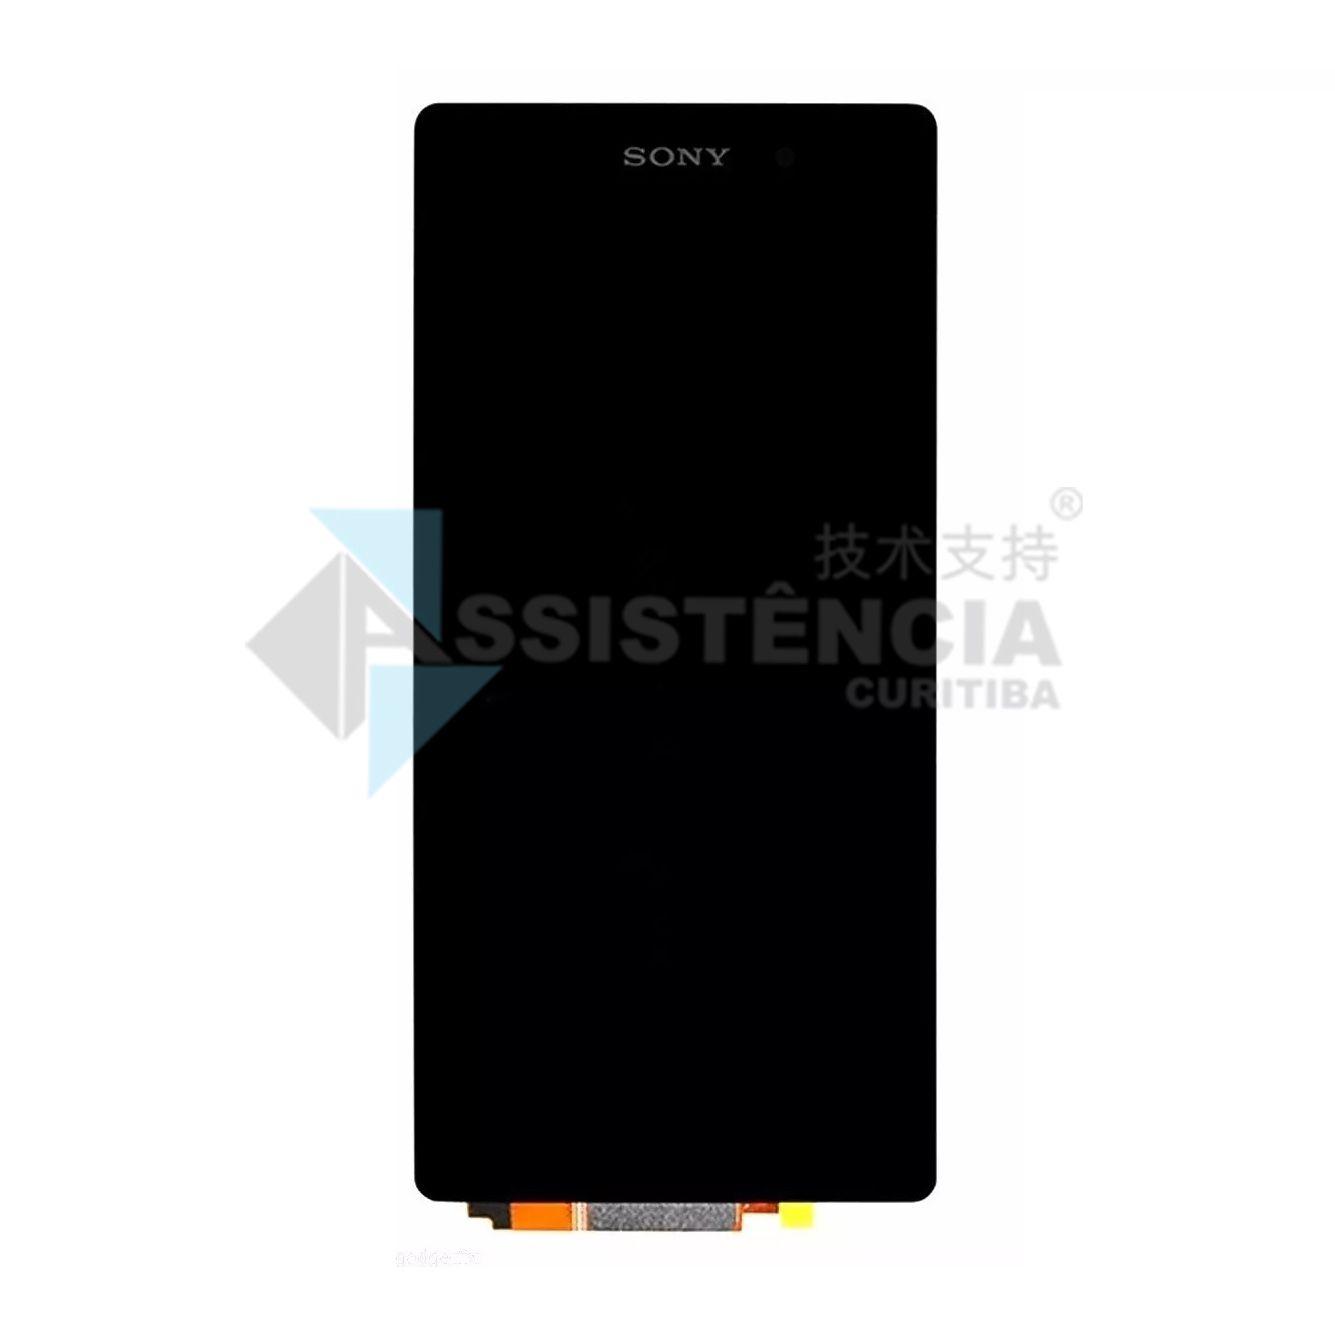 Tela Display Sony Xperia Z2 D6503 D6543